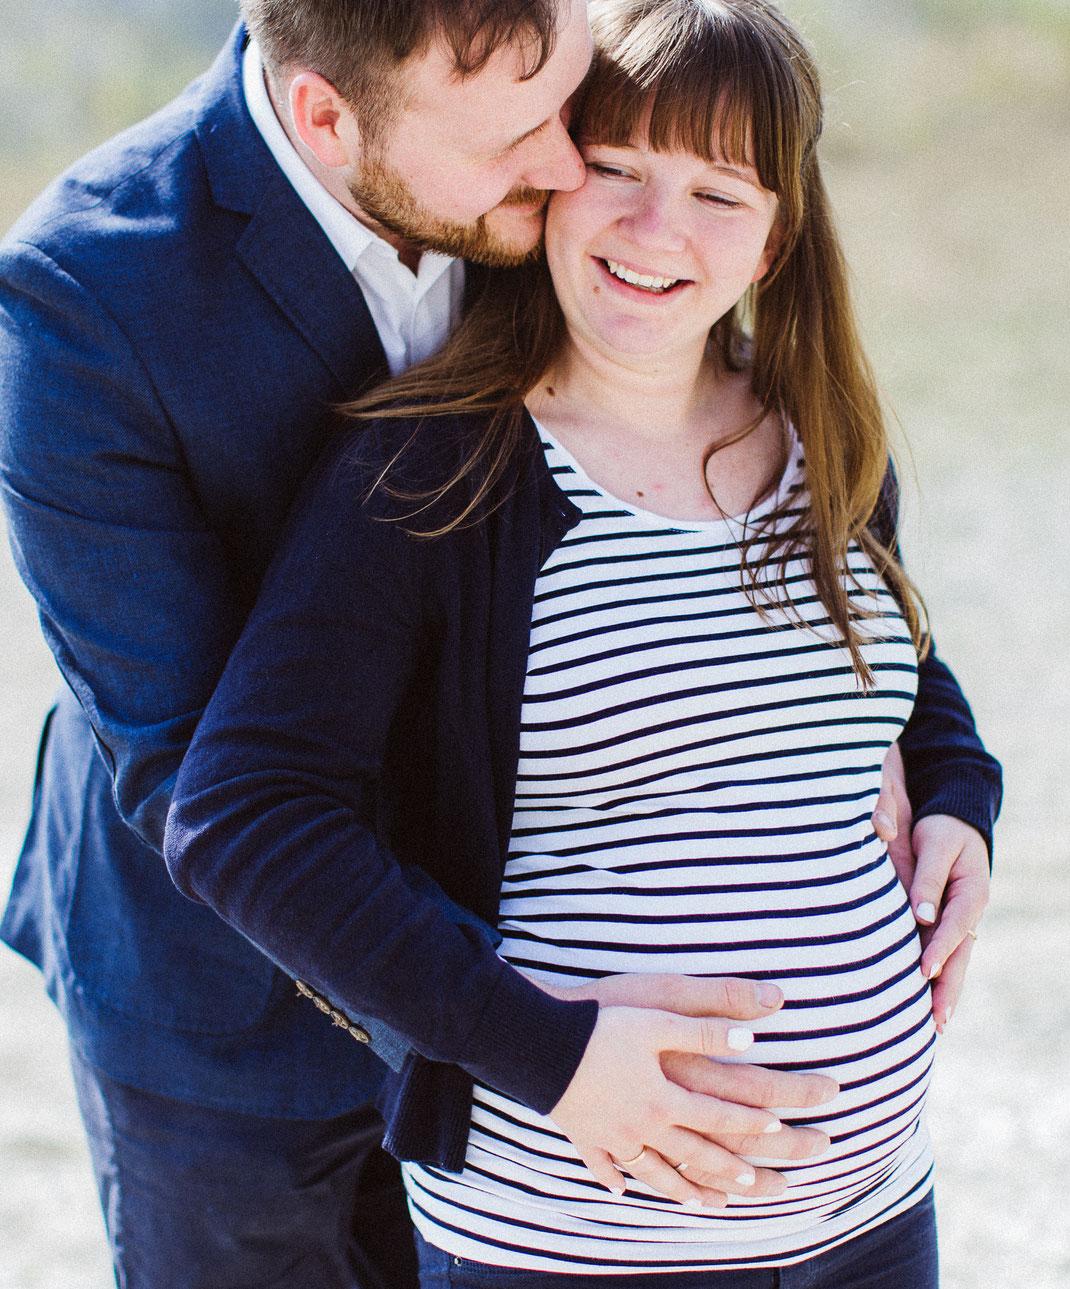 mergelgrube, hannover, people, portrait, babybauch, pregnant, love , couple, fotografbremen, fotografhannover, sabinelange